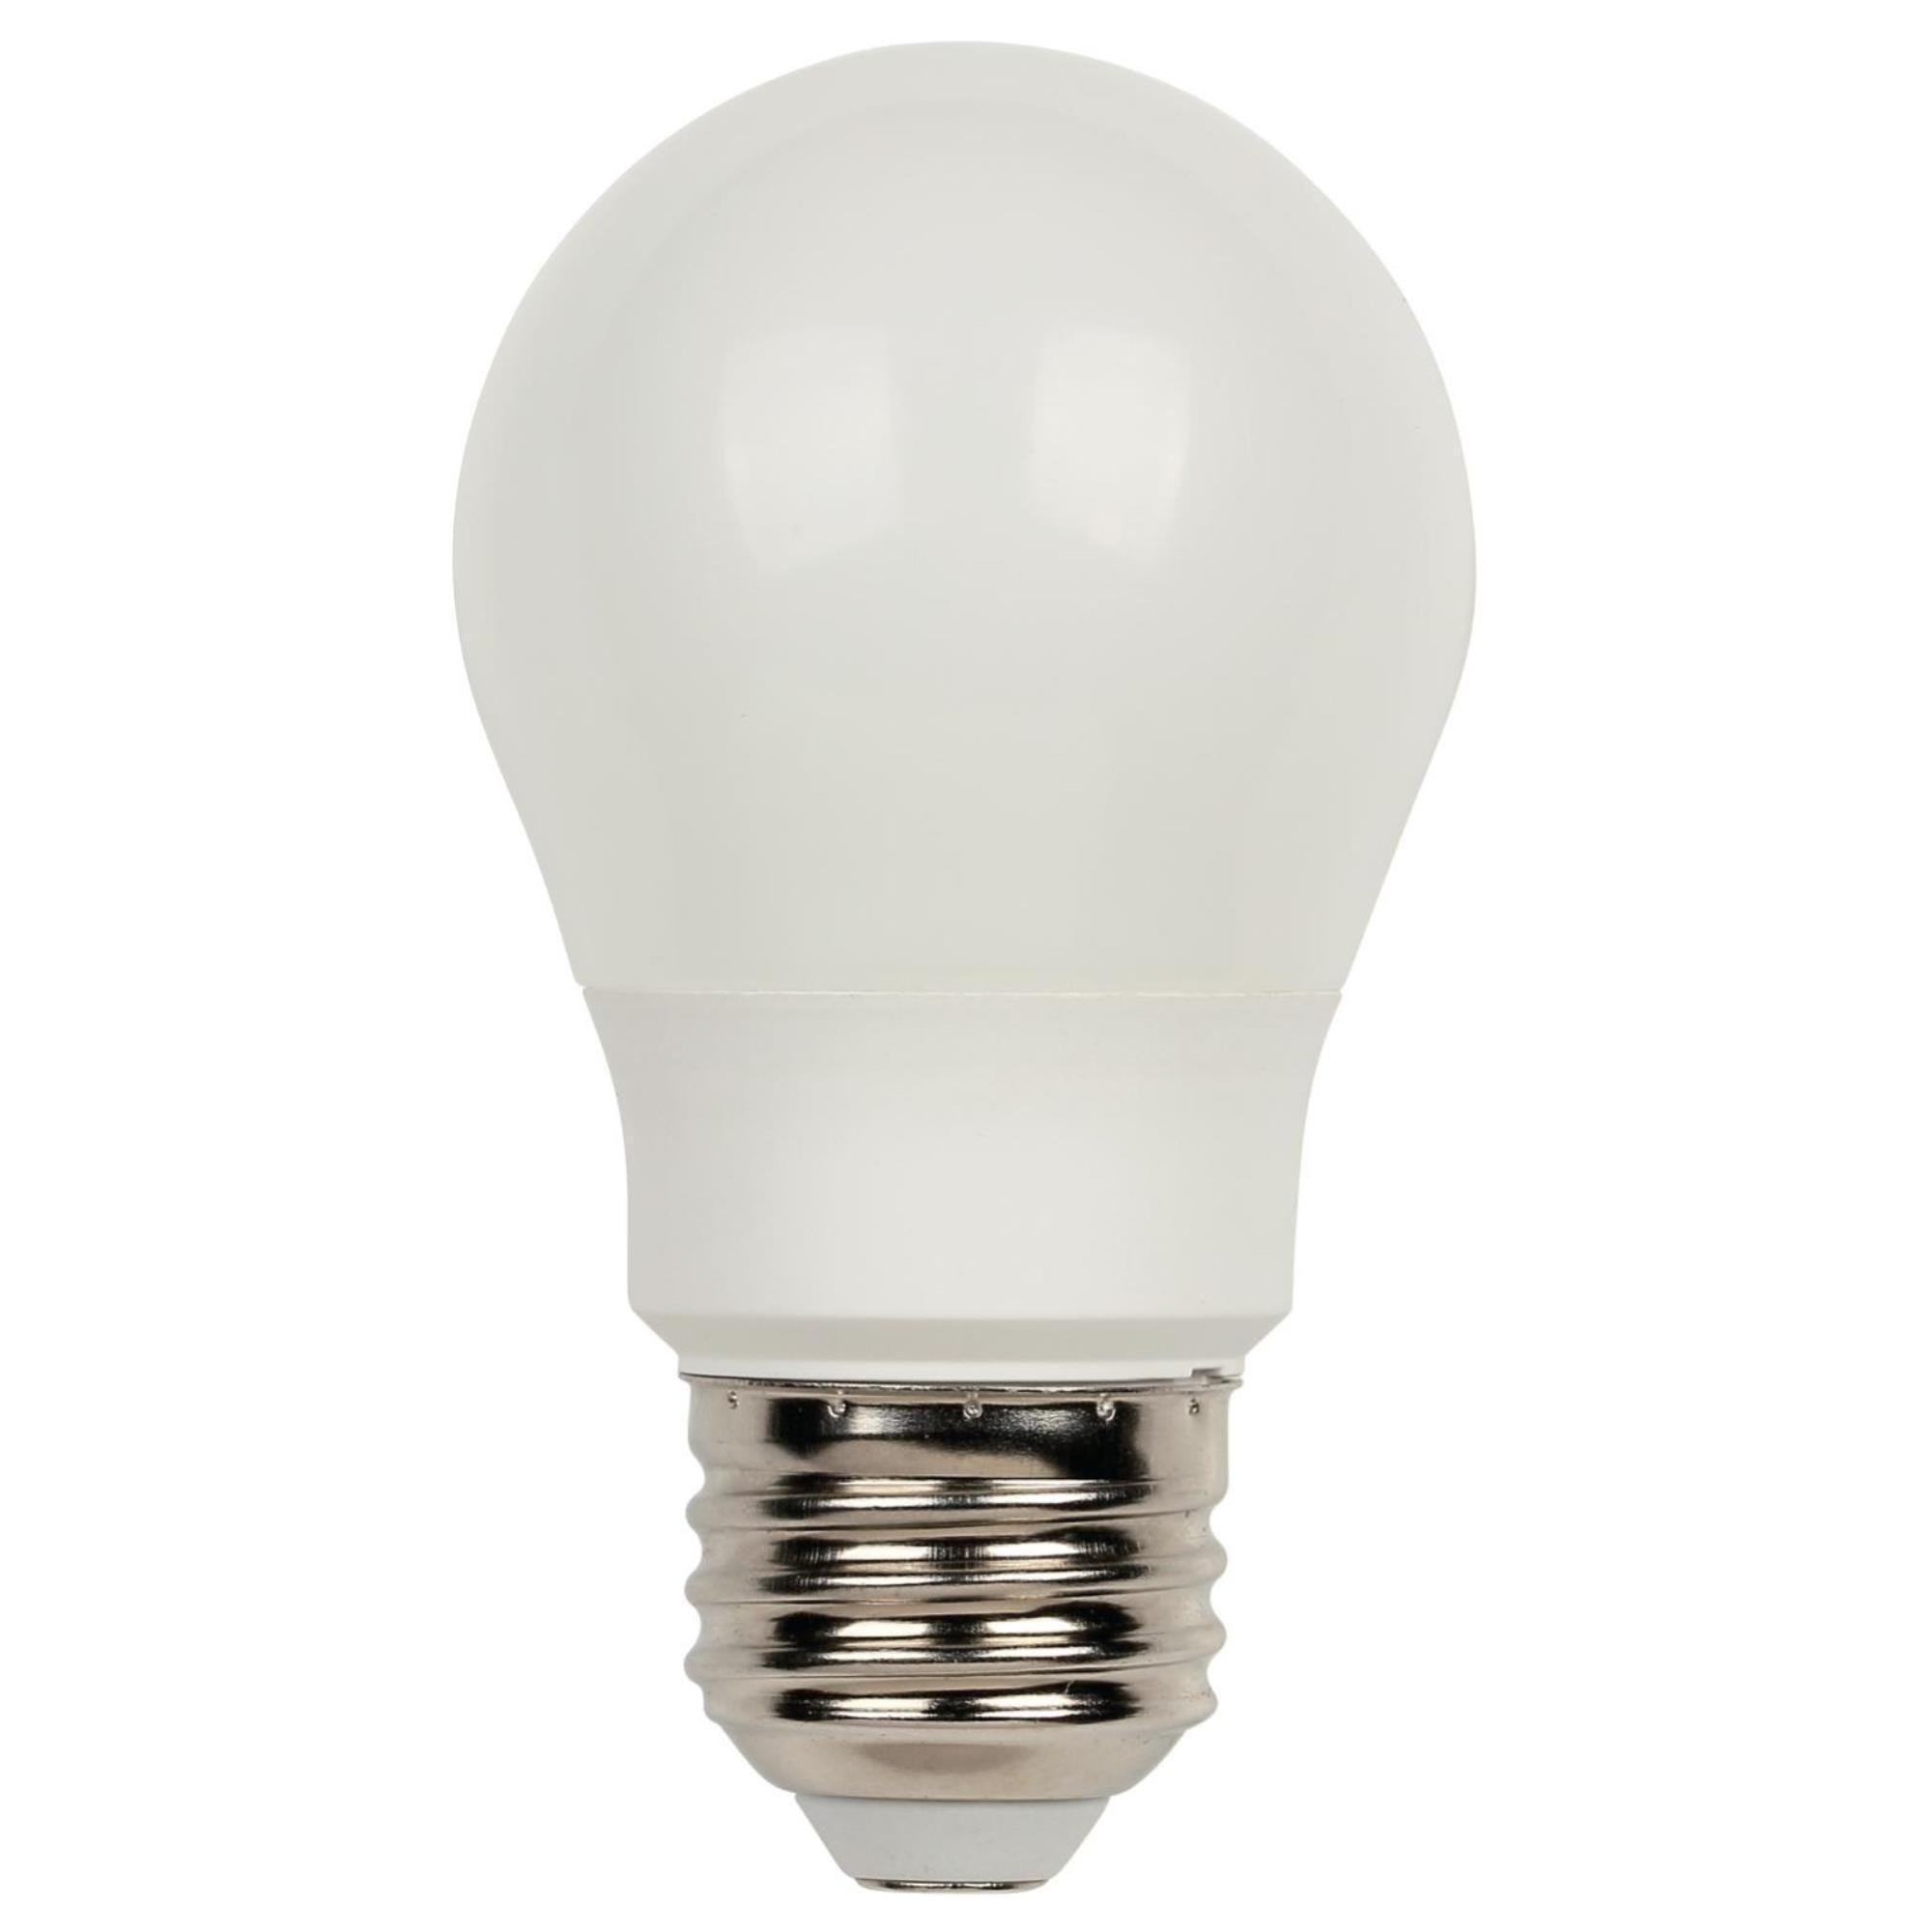 Westinghouse Lighting 4513600 60-Watt Equivalent A15 Soft White LED Light Bulb with Medium Base Single Pack